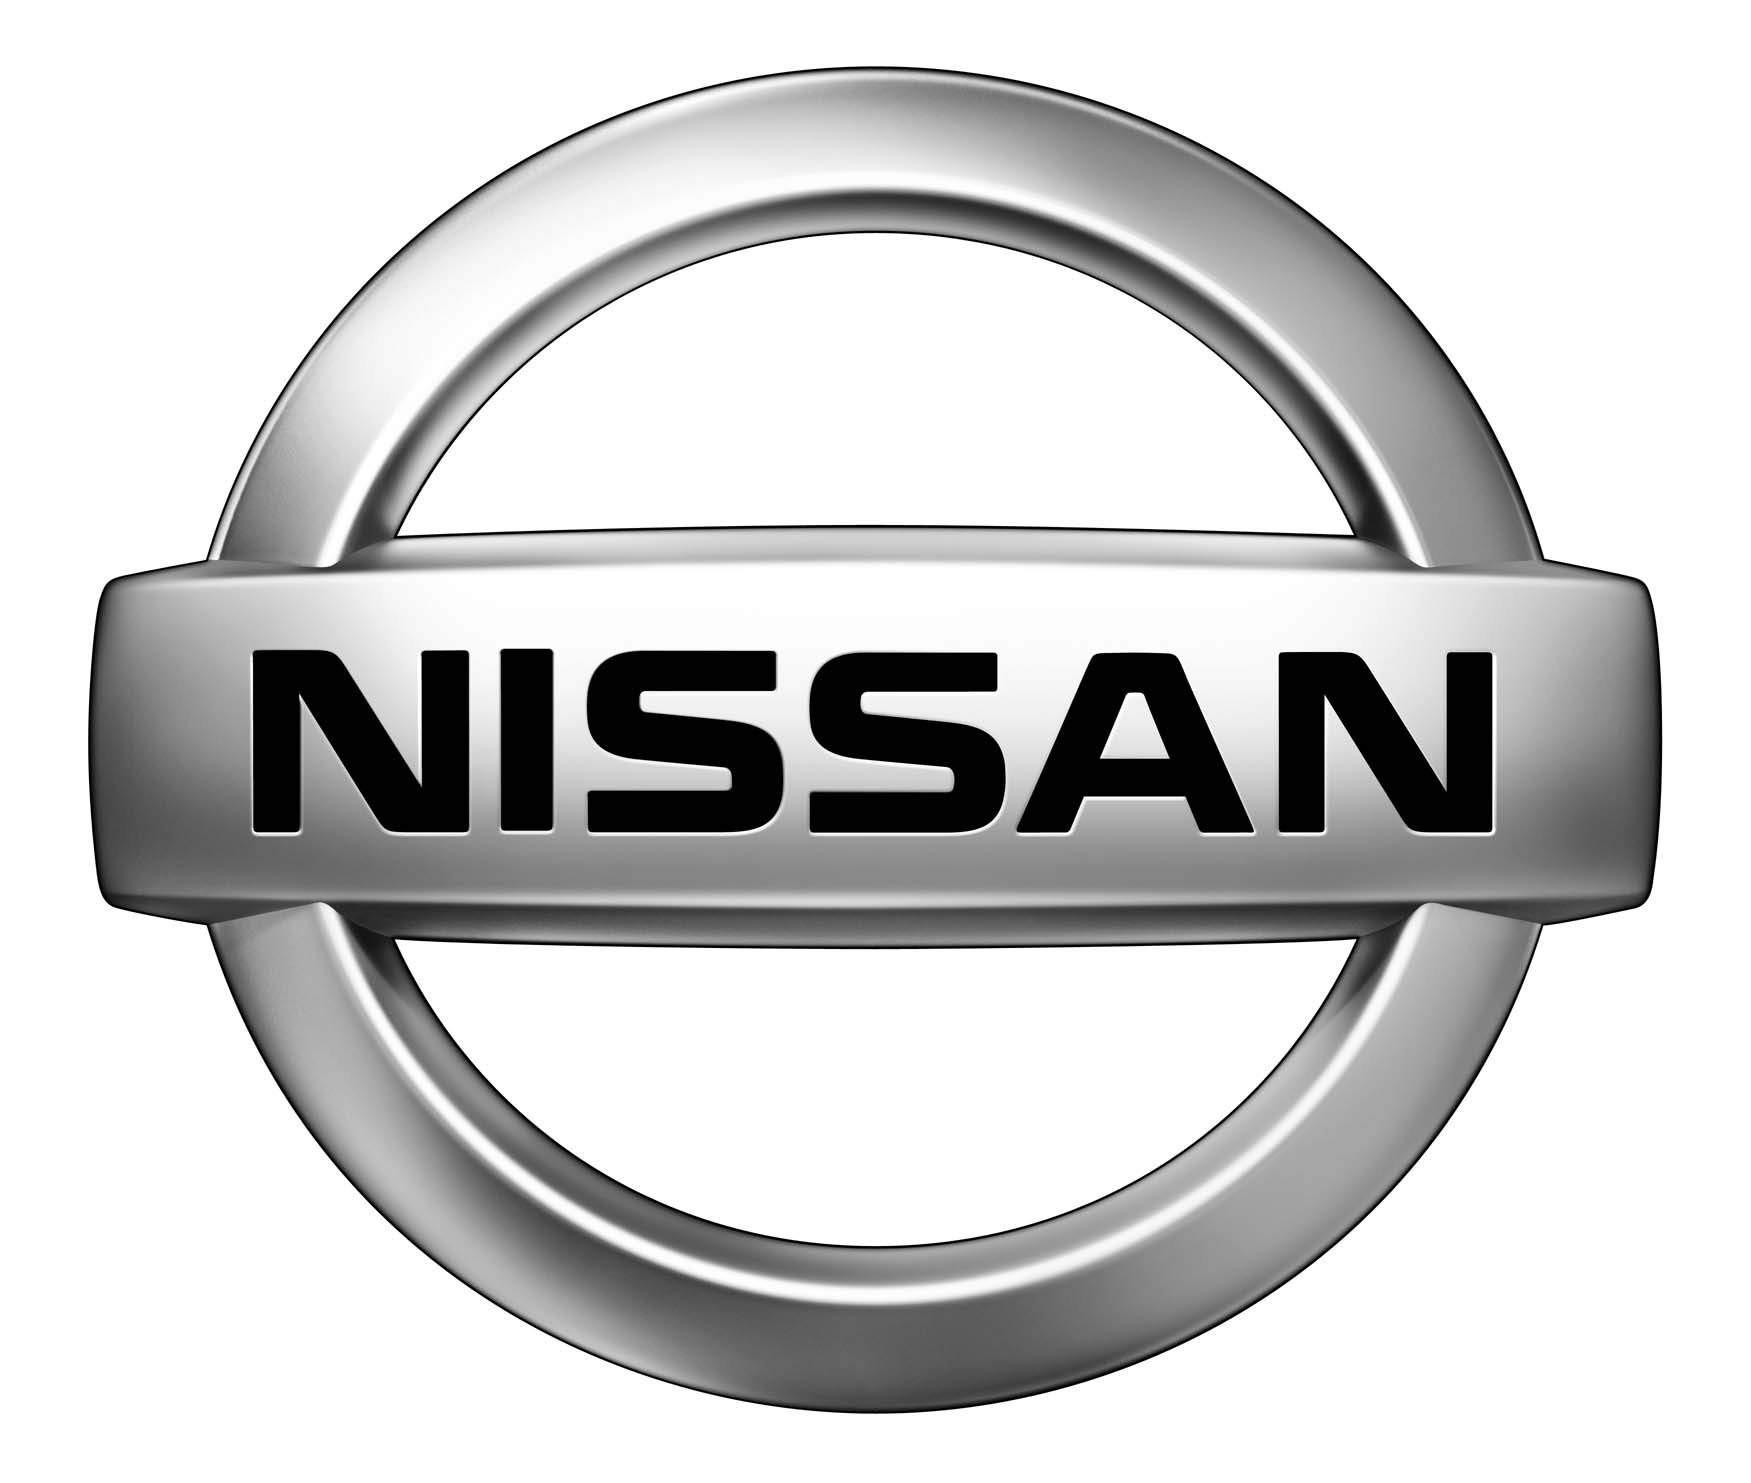 Nissan i Ballerup